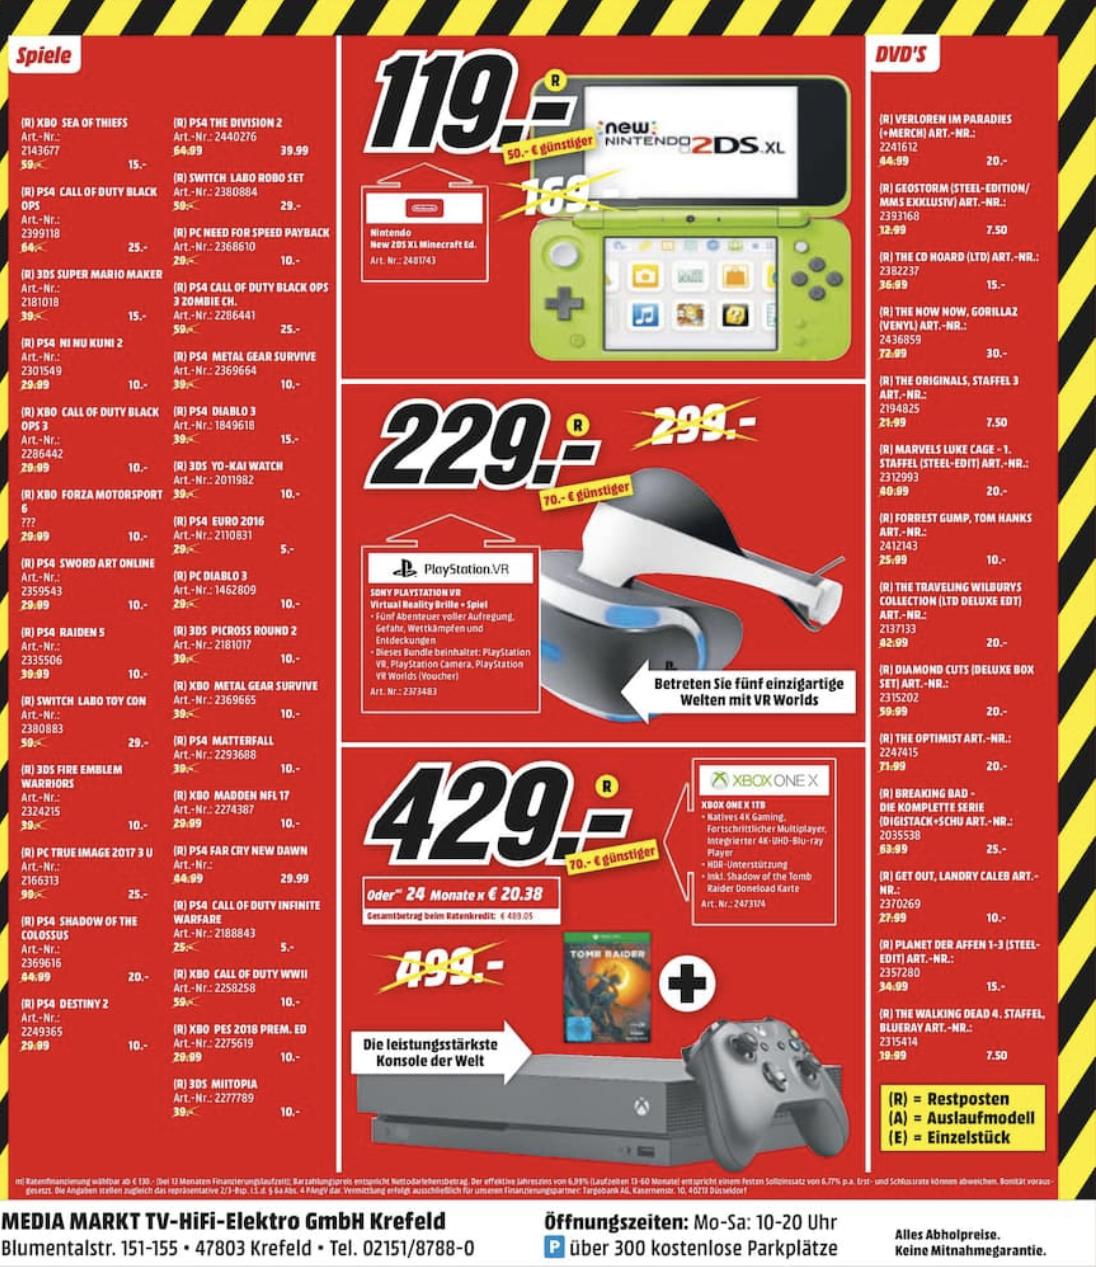 [Lokal: Media Markt Krefeld] PS4, XBO & 3DS-Games im Abverkauf: z.B Ni No Kuni 2 PS4 /  CoD World War II XBO @10€ / Miitopia 3DS @10€ / uvm.